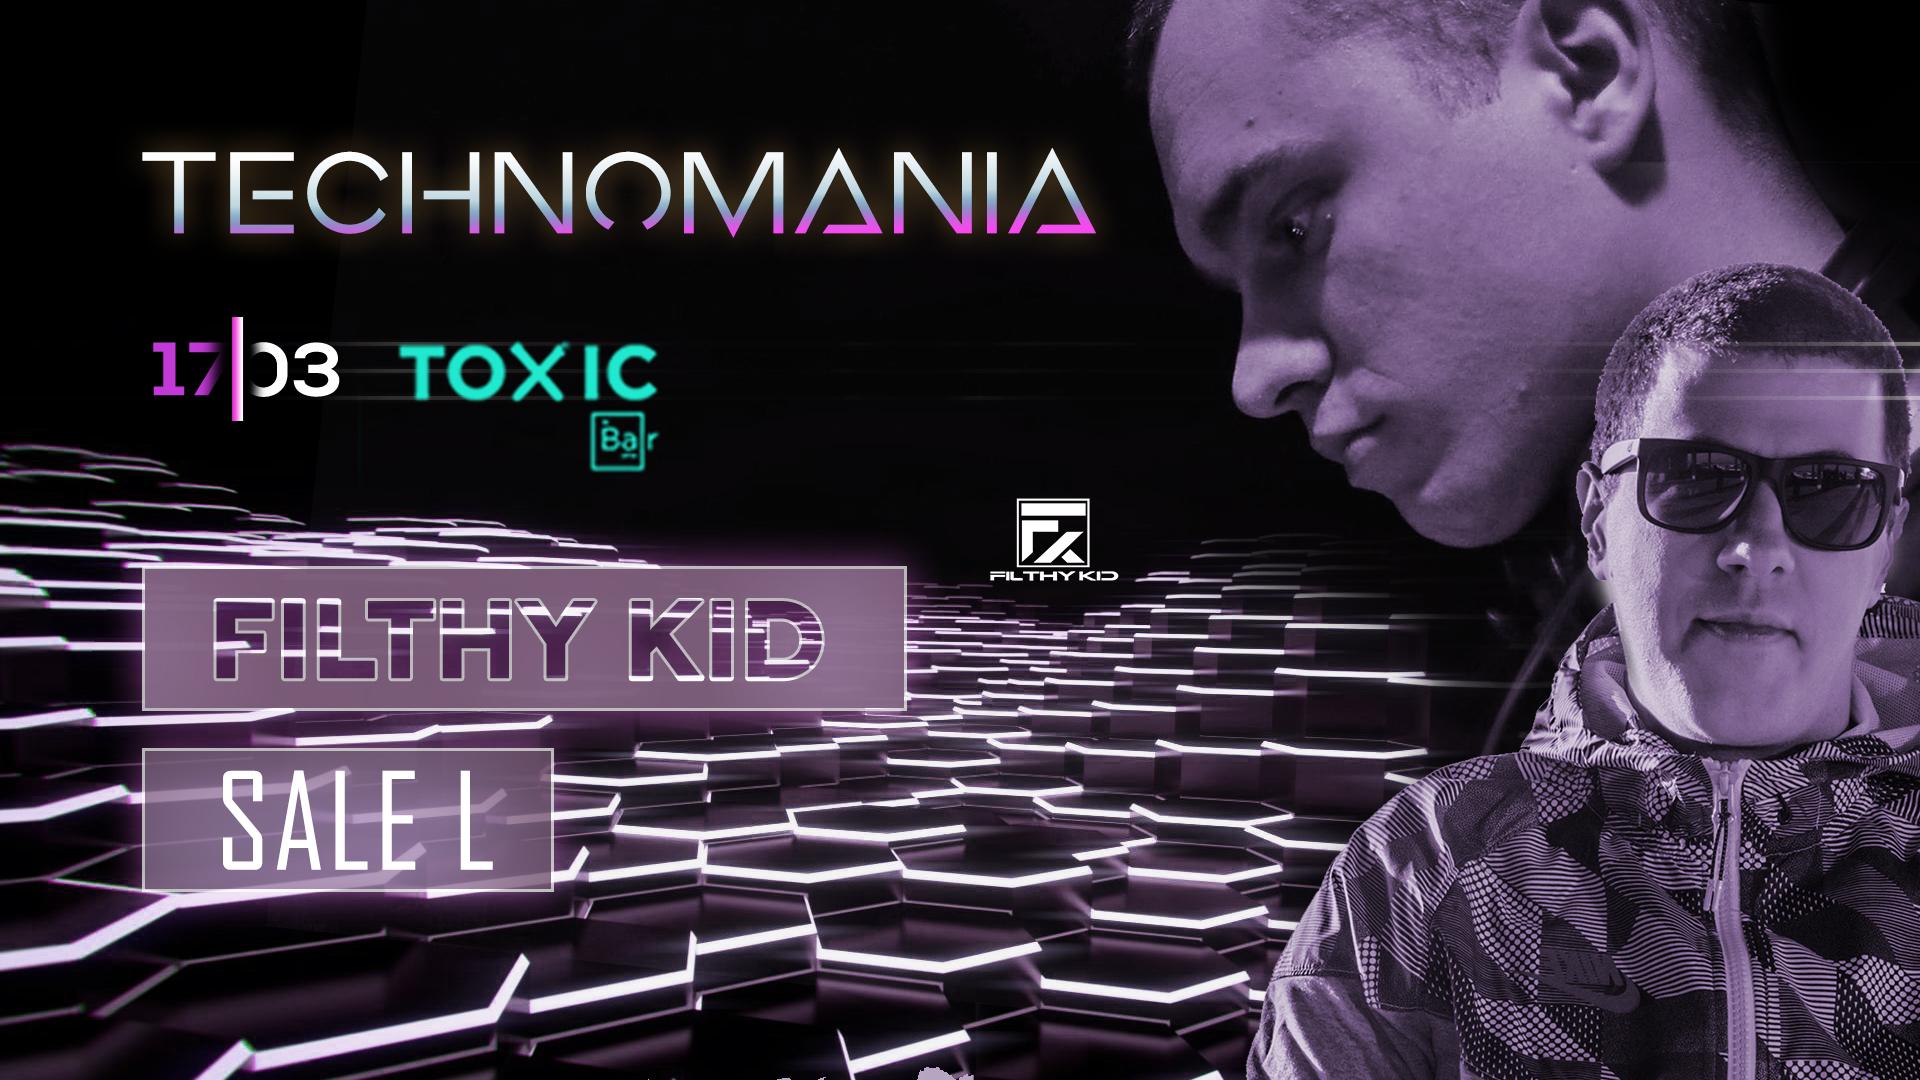 Toxic Bar